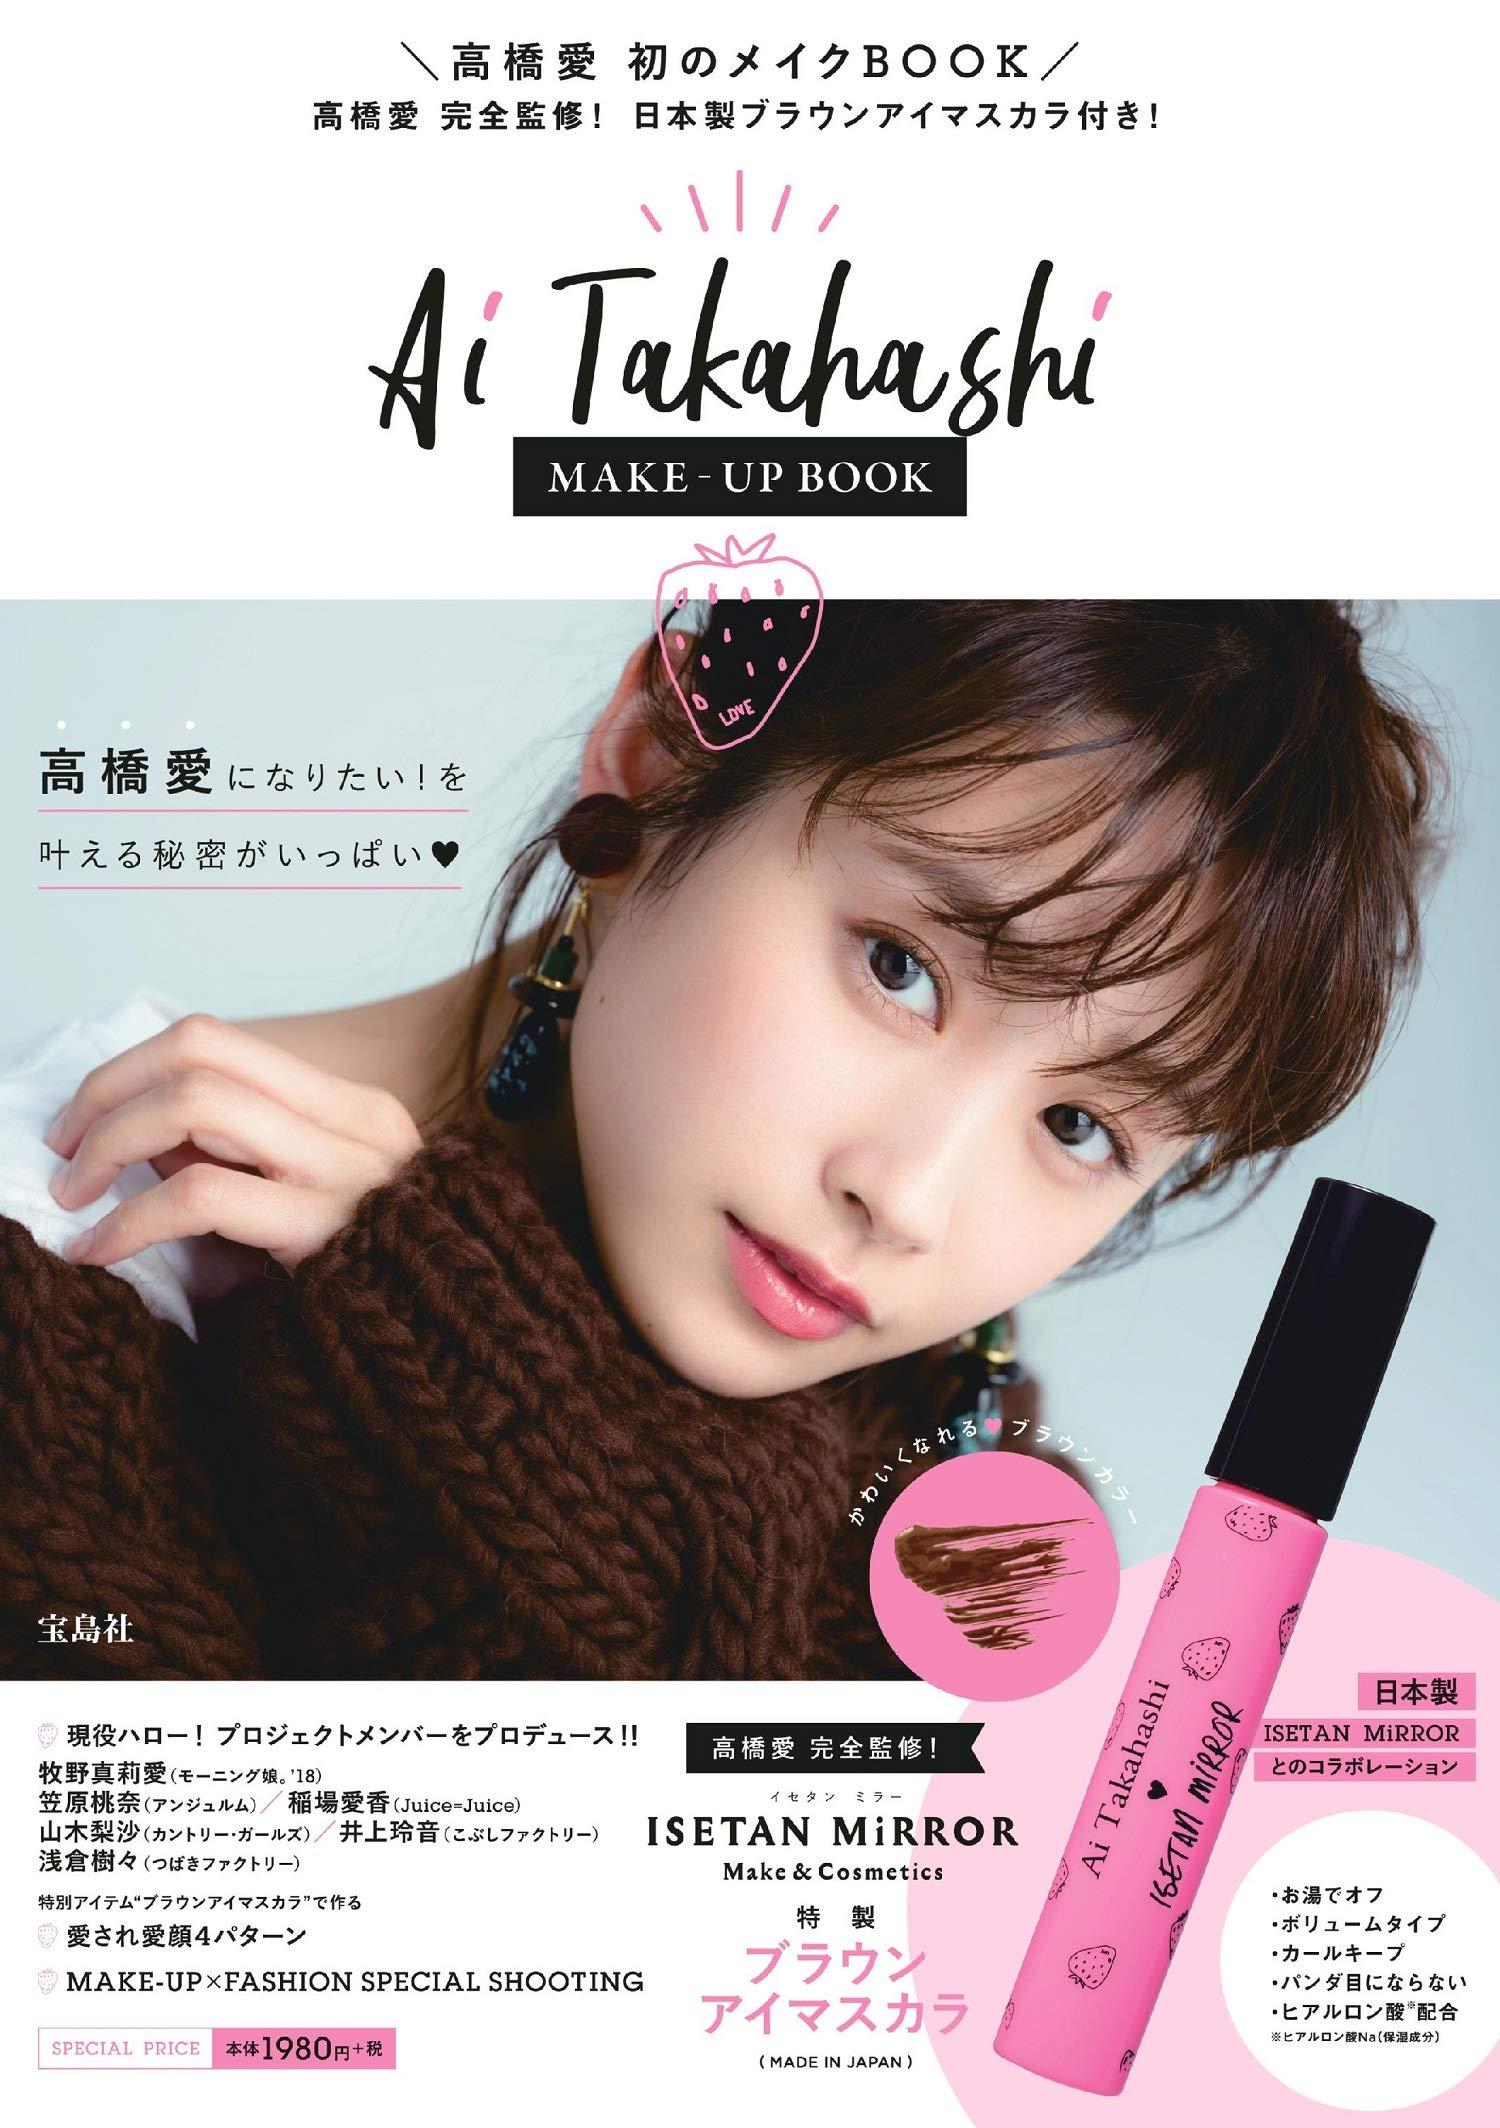 Ai Takahashi MAKE-UP BOOKにマルティナが紹介されました。